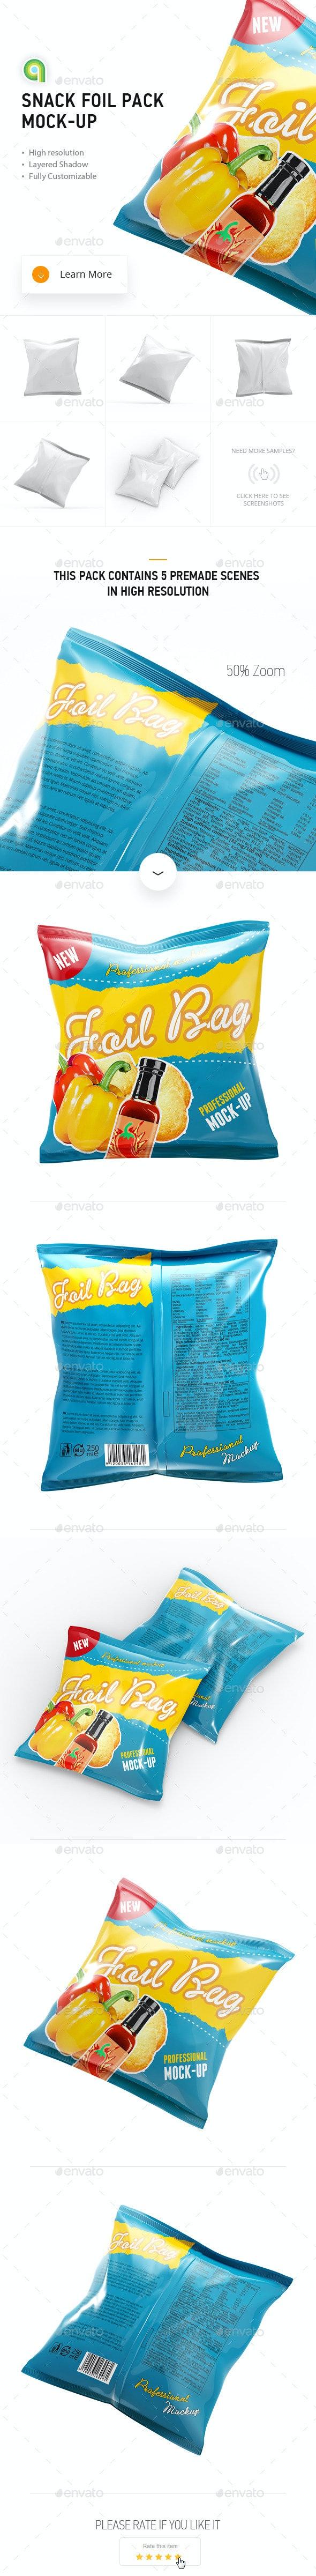 Snack Foil Pack Mock-up - Food and Drink Packaging